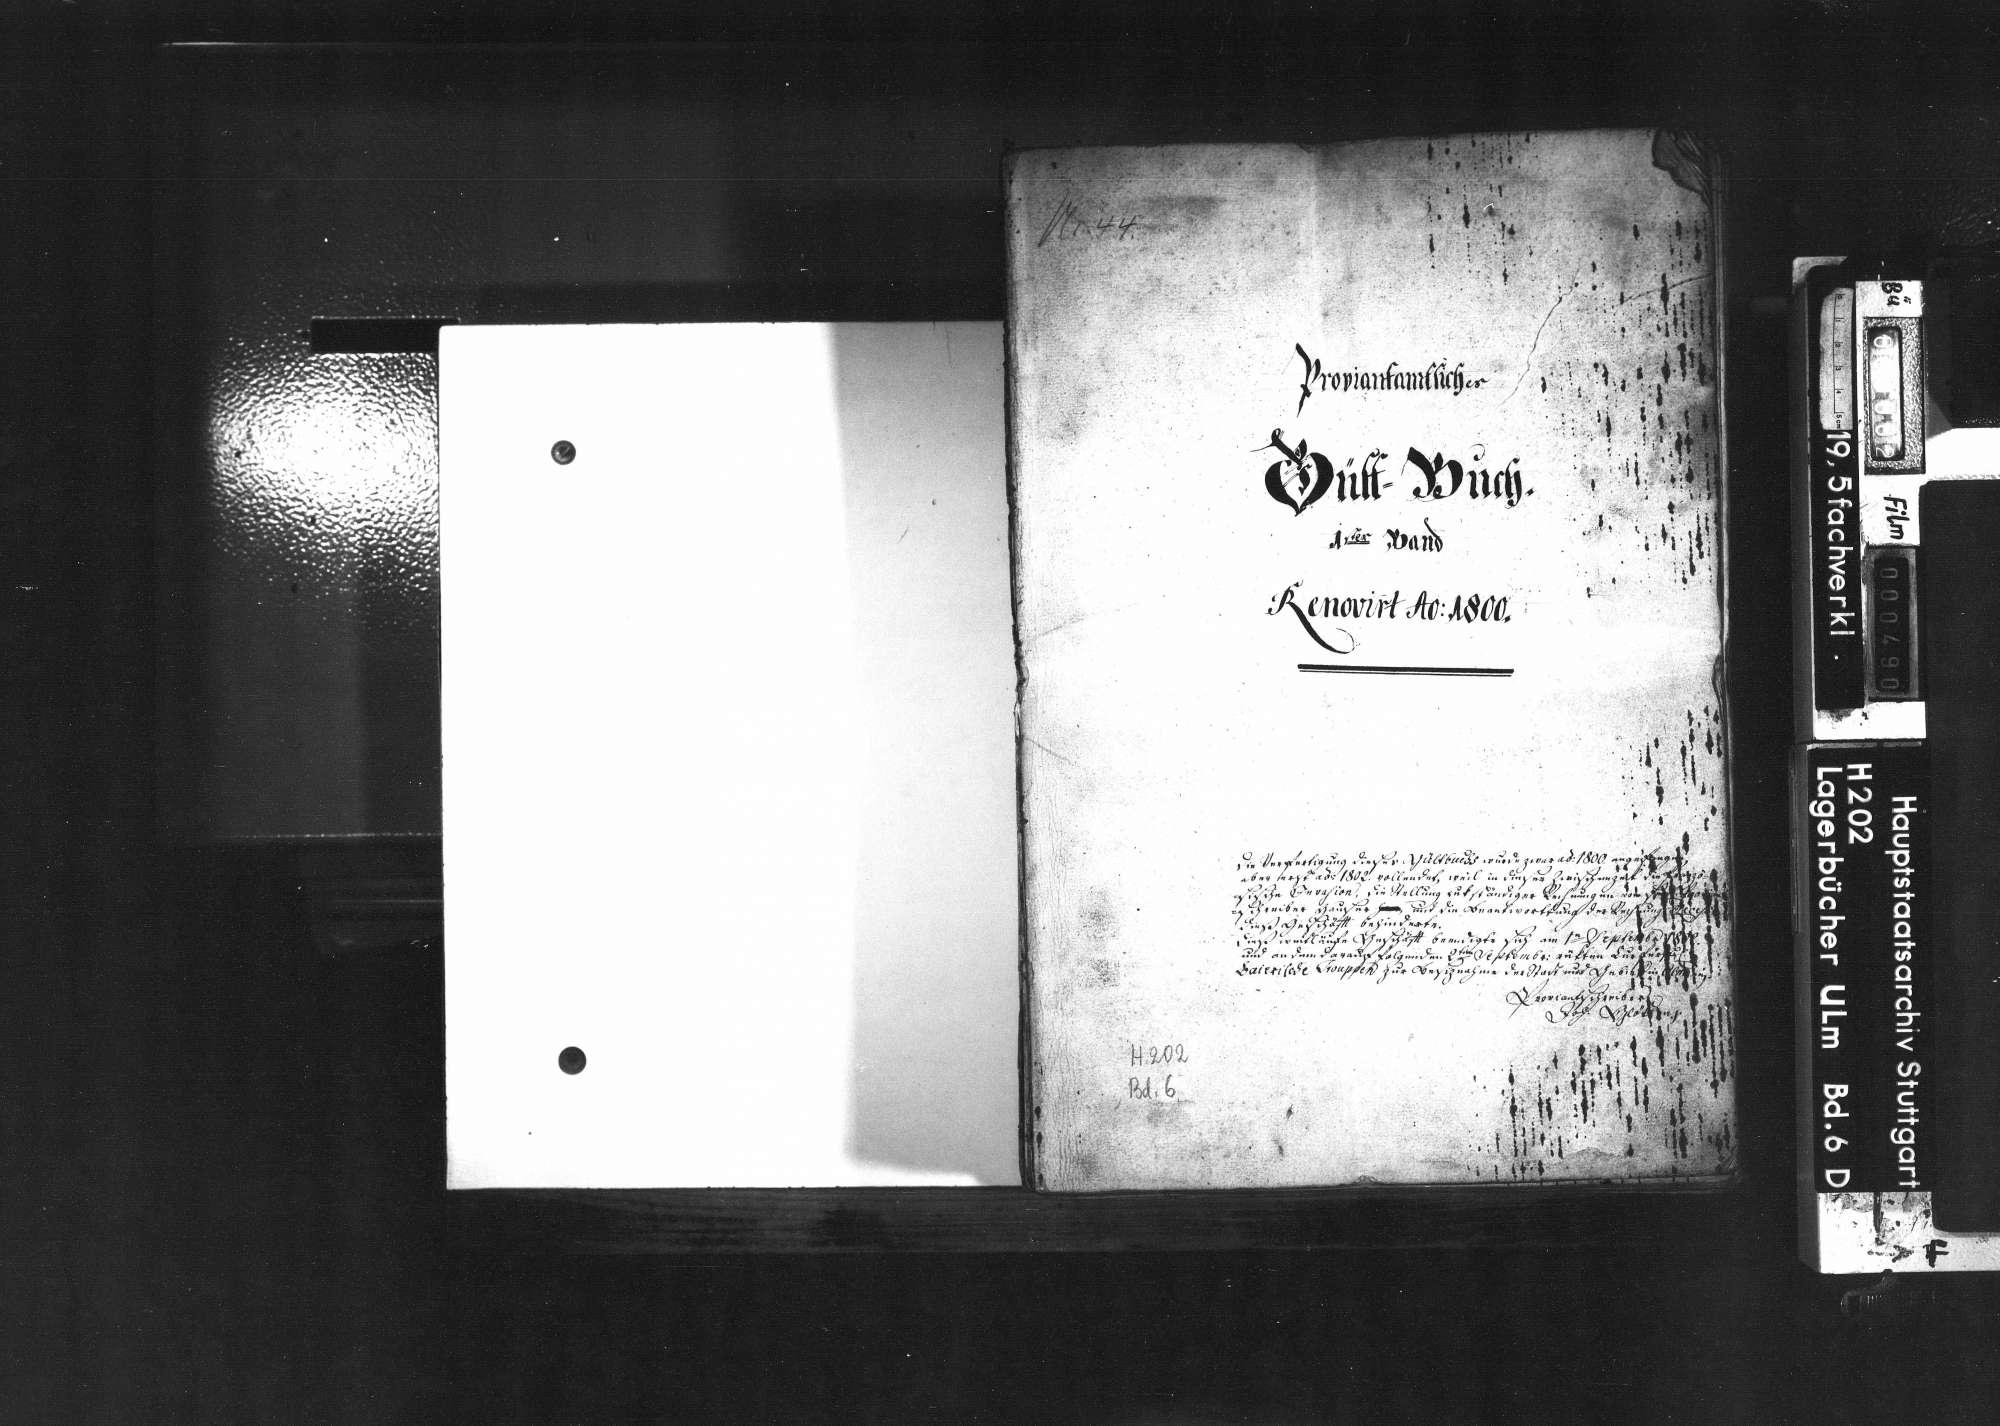 Gültbuch, Bild 1